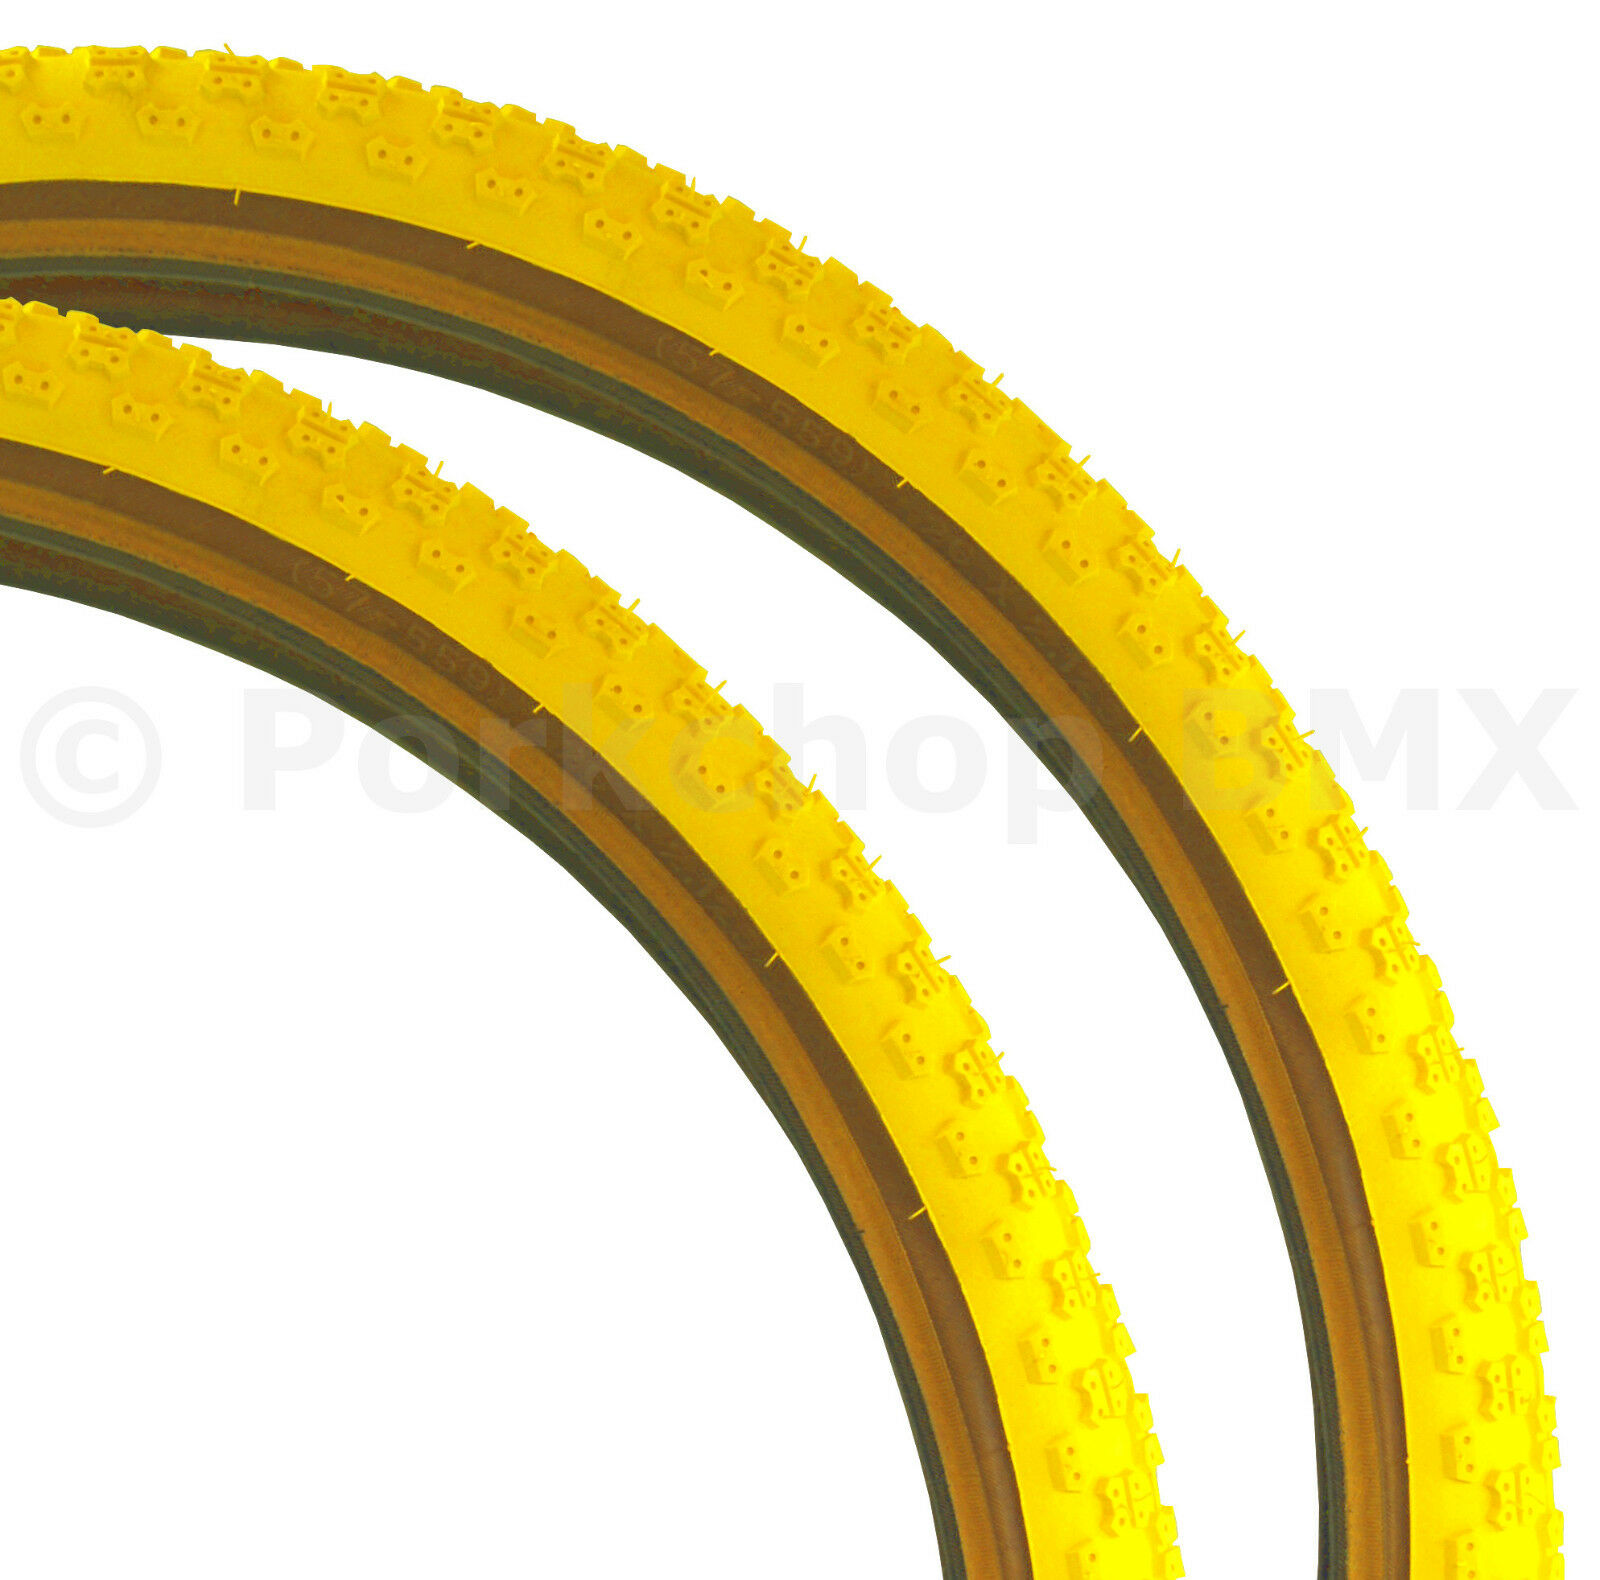 Kenda Comp 3 III old school BMX skinwall  gumwall tires PAIR 26  X 2.125  YELLOW  perfect